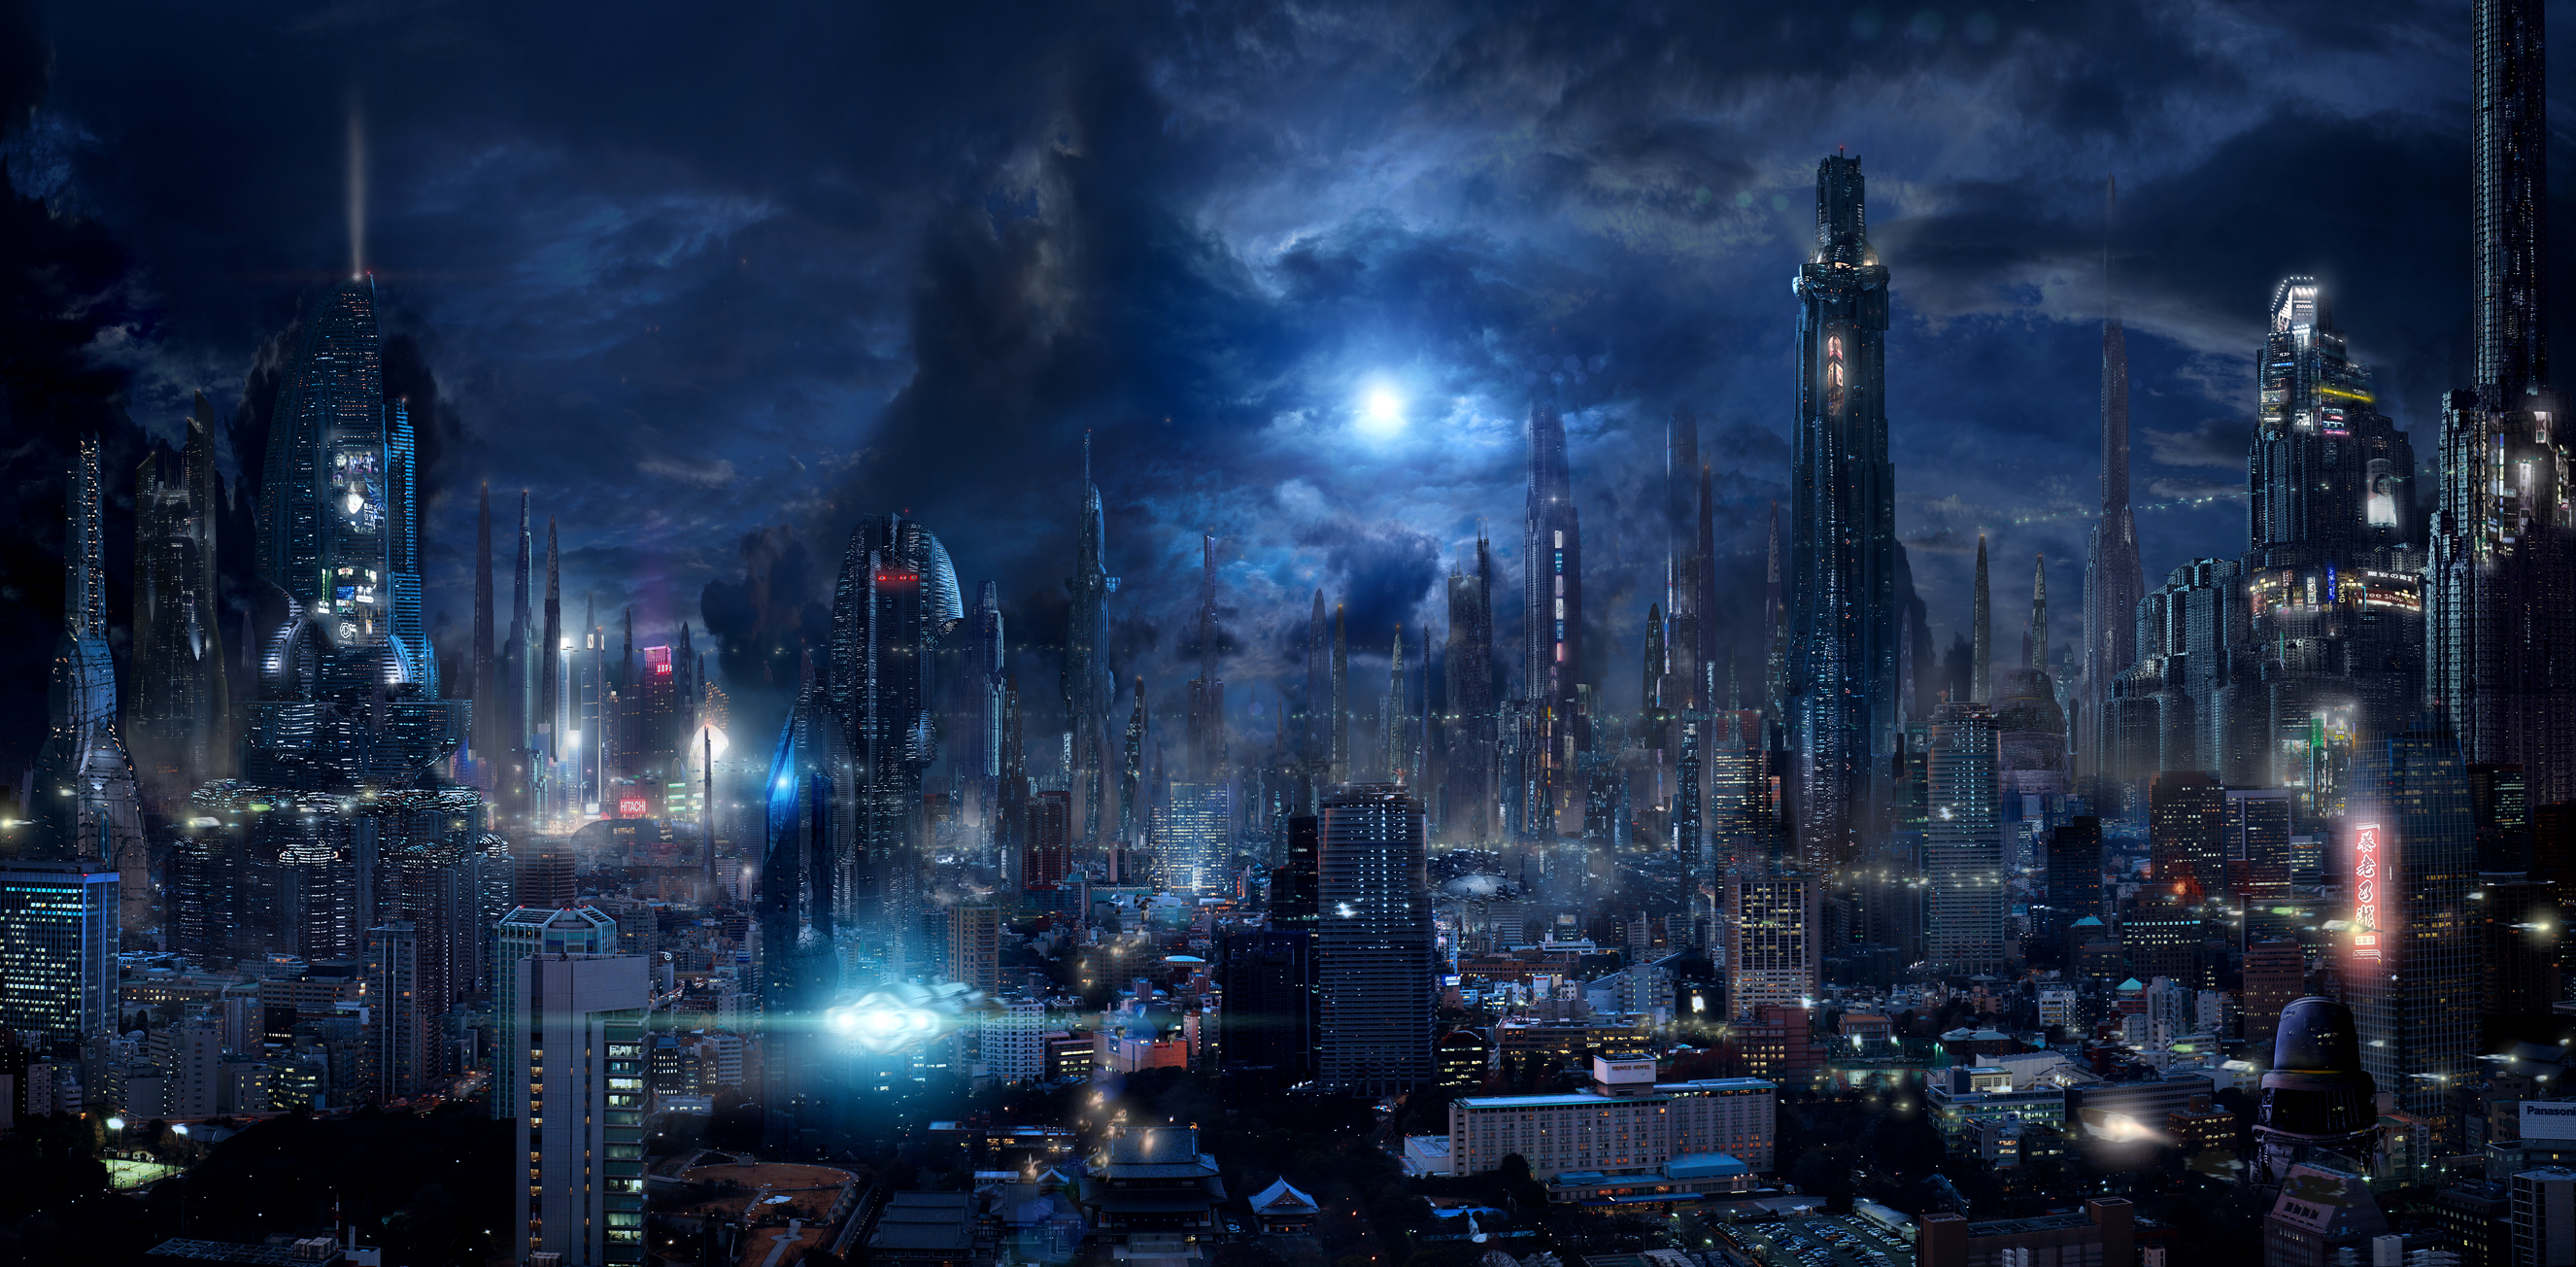 Future City 9 By Rich35211 On DeviantArt